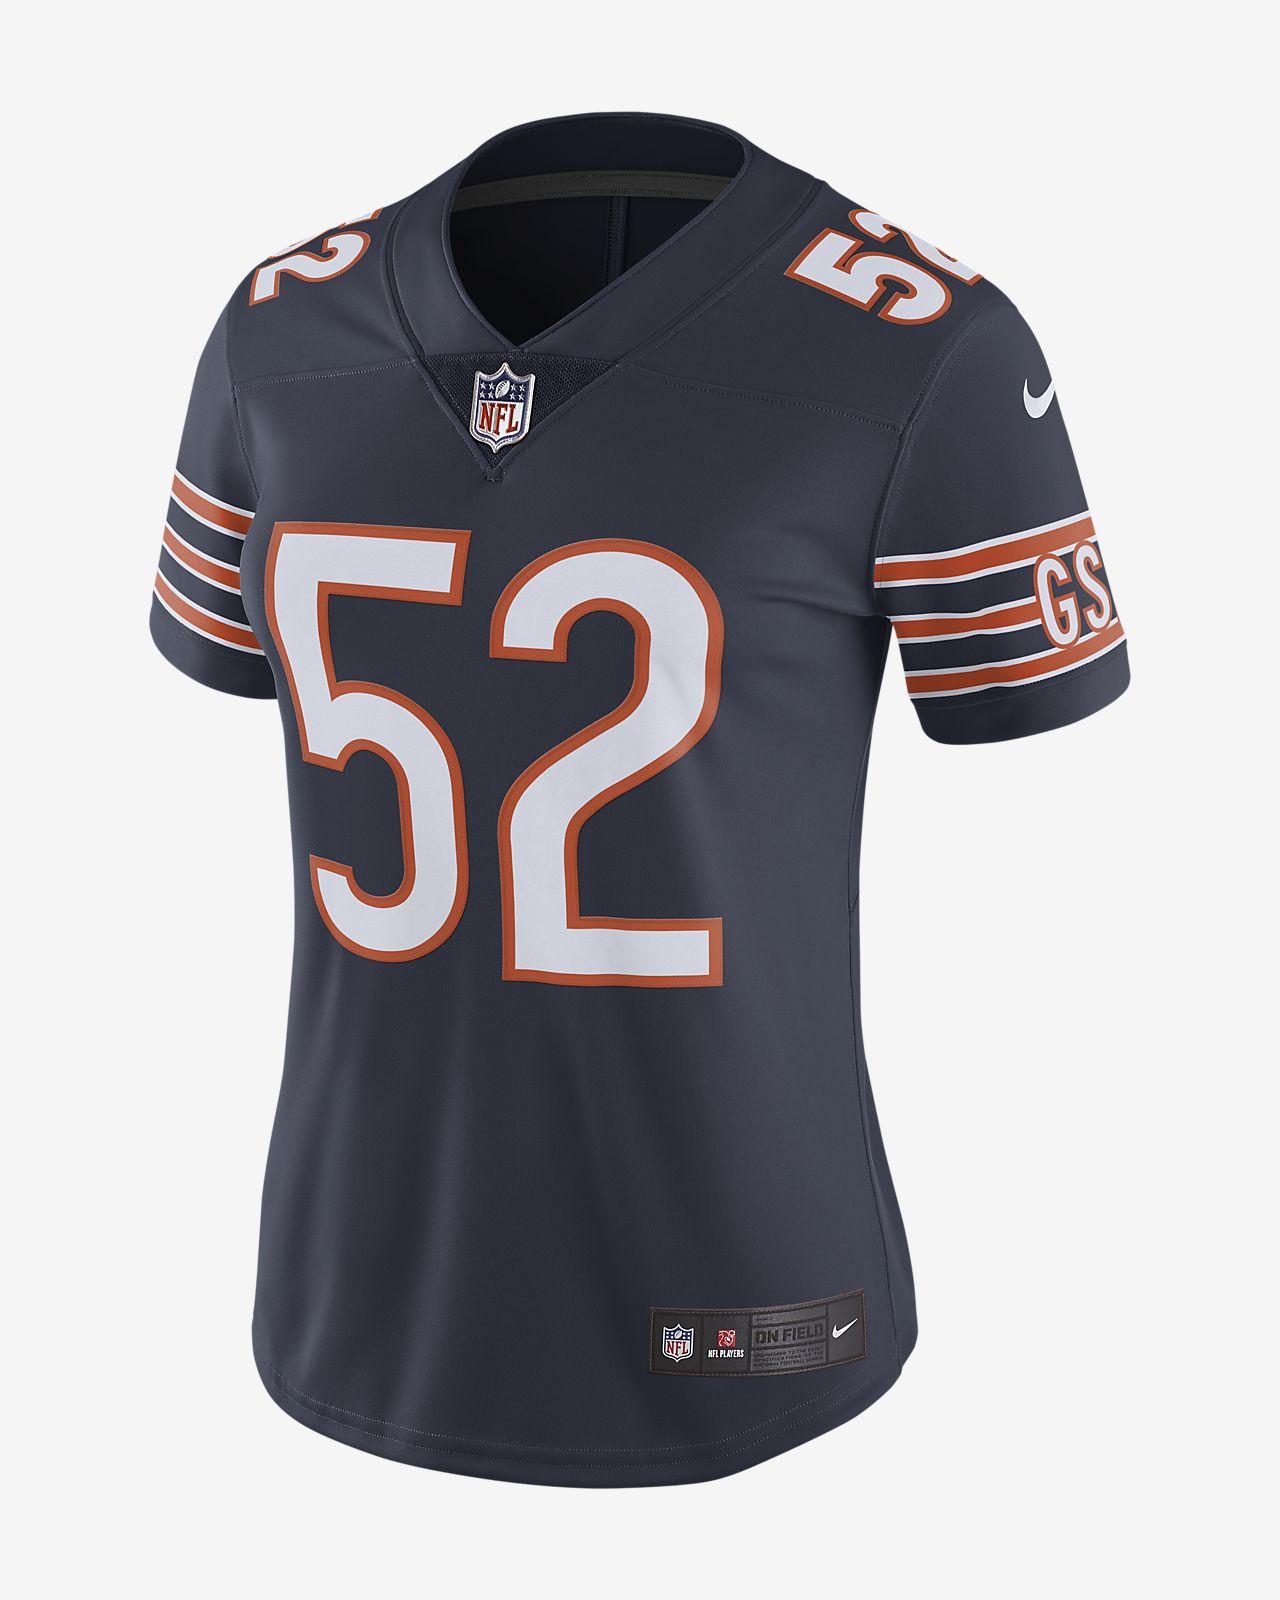 new style b18f1 d2e65 NFL Chicago Bears Limited (Khalil Mack) Women's Football Jersey